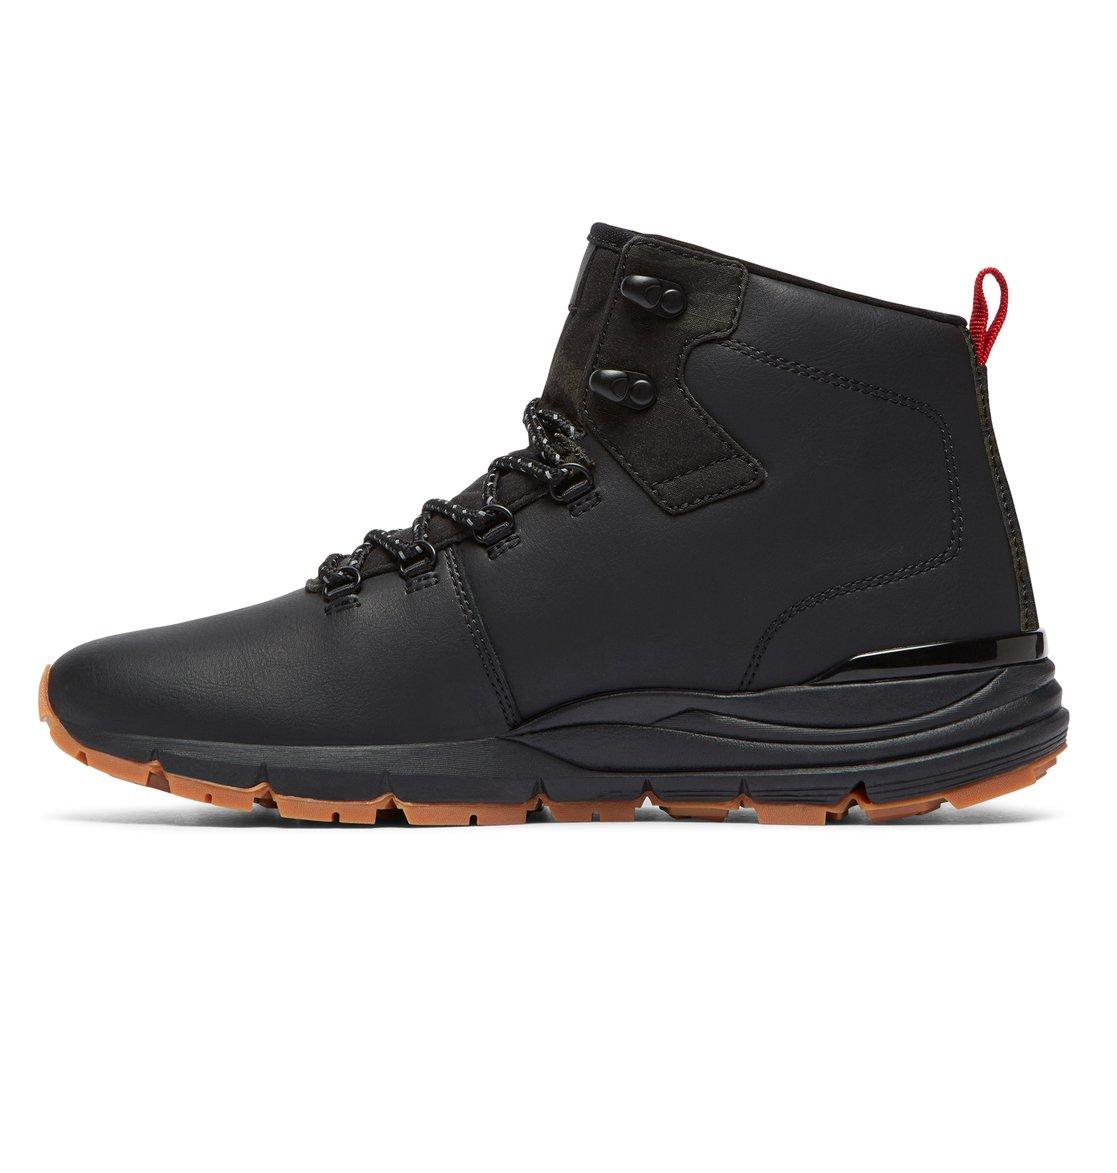 9f0151422b35da 2 Muirland Lace-Up Leather Boots Black ADYB700021 DC Shoes